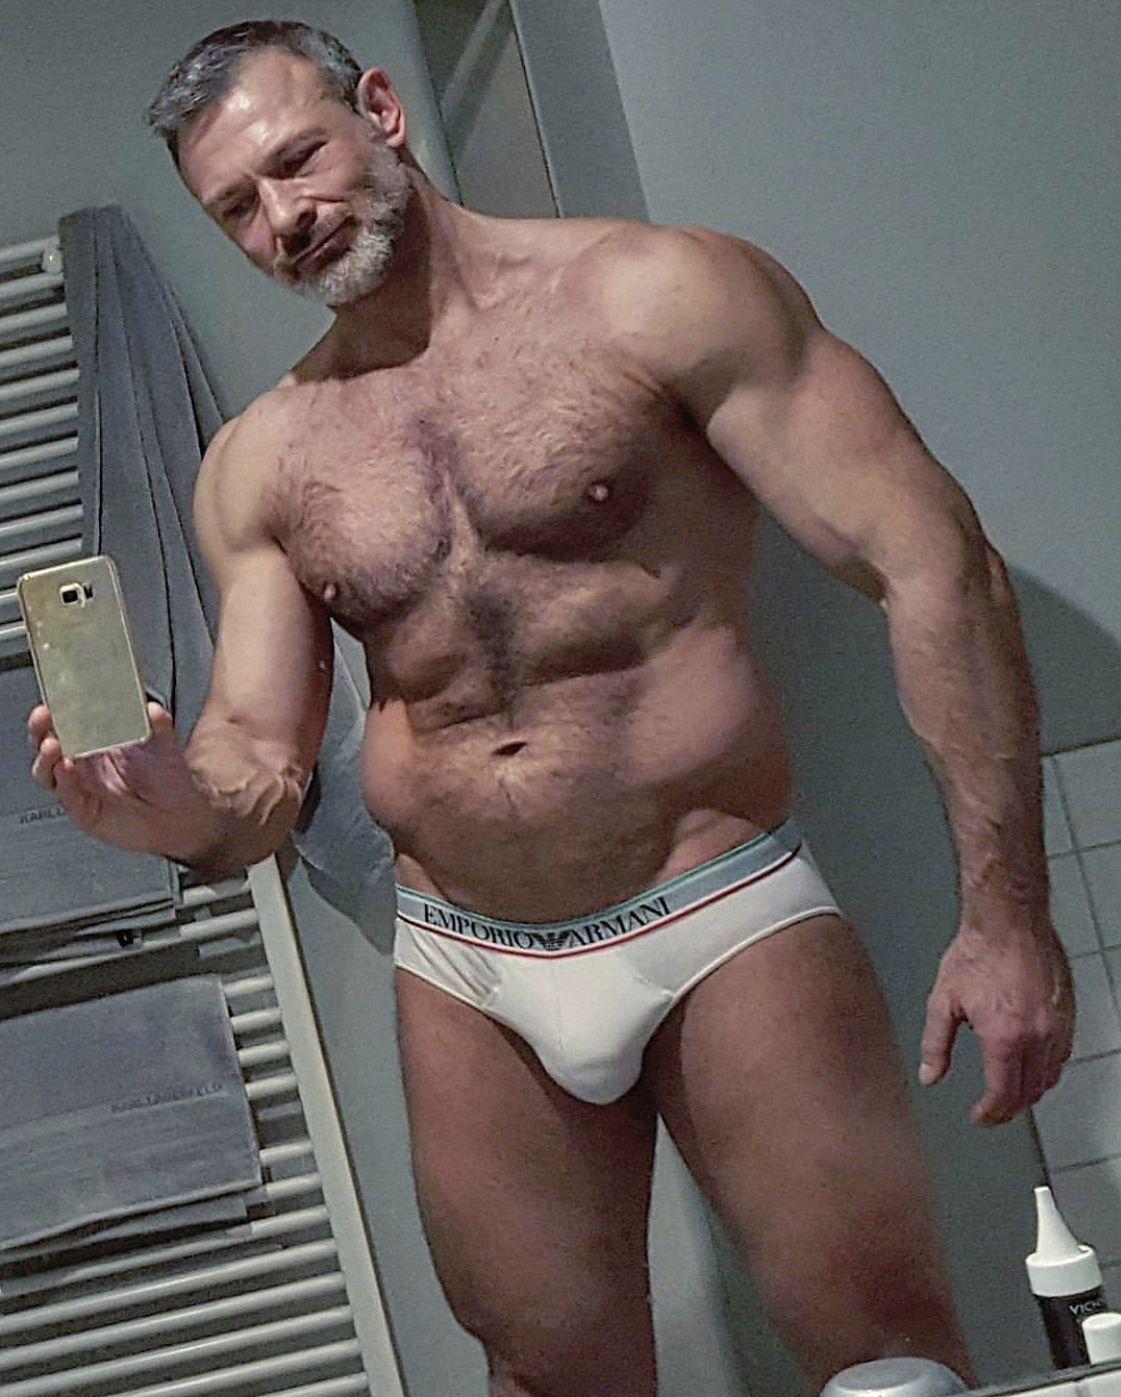 Messy shorts asian daddy